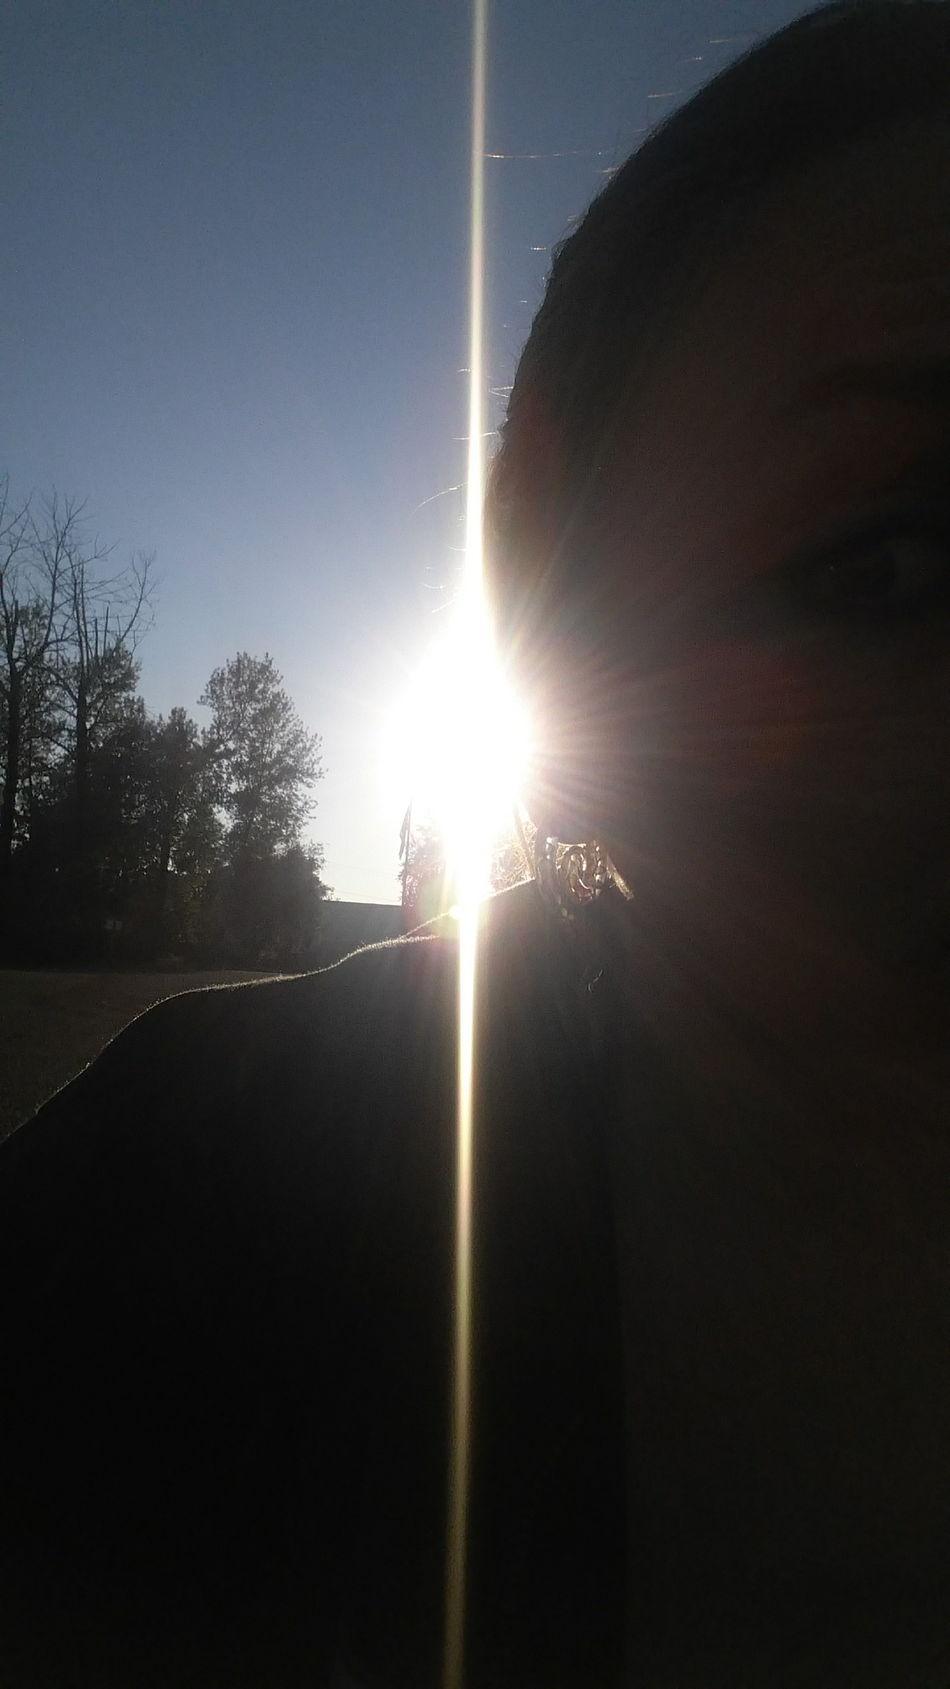 WestCoastSunrise OregonCity Sunrise Selfies Sunriseselfie That's Me Its All About The Angle Sunny Sunshine Sunshine Silhoutte Lens Flare Check This Out Hello World Pnwlife Portland, OR Pdxsummer Clackamas SassAFrass SassyBadass INeedARockstar 43 Golden Moments 43GoldenMoments